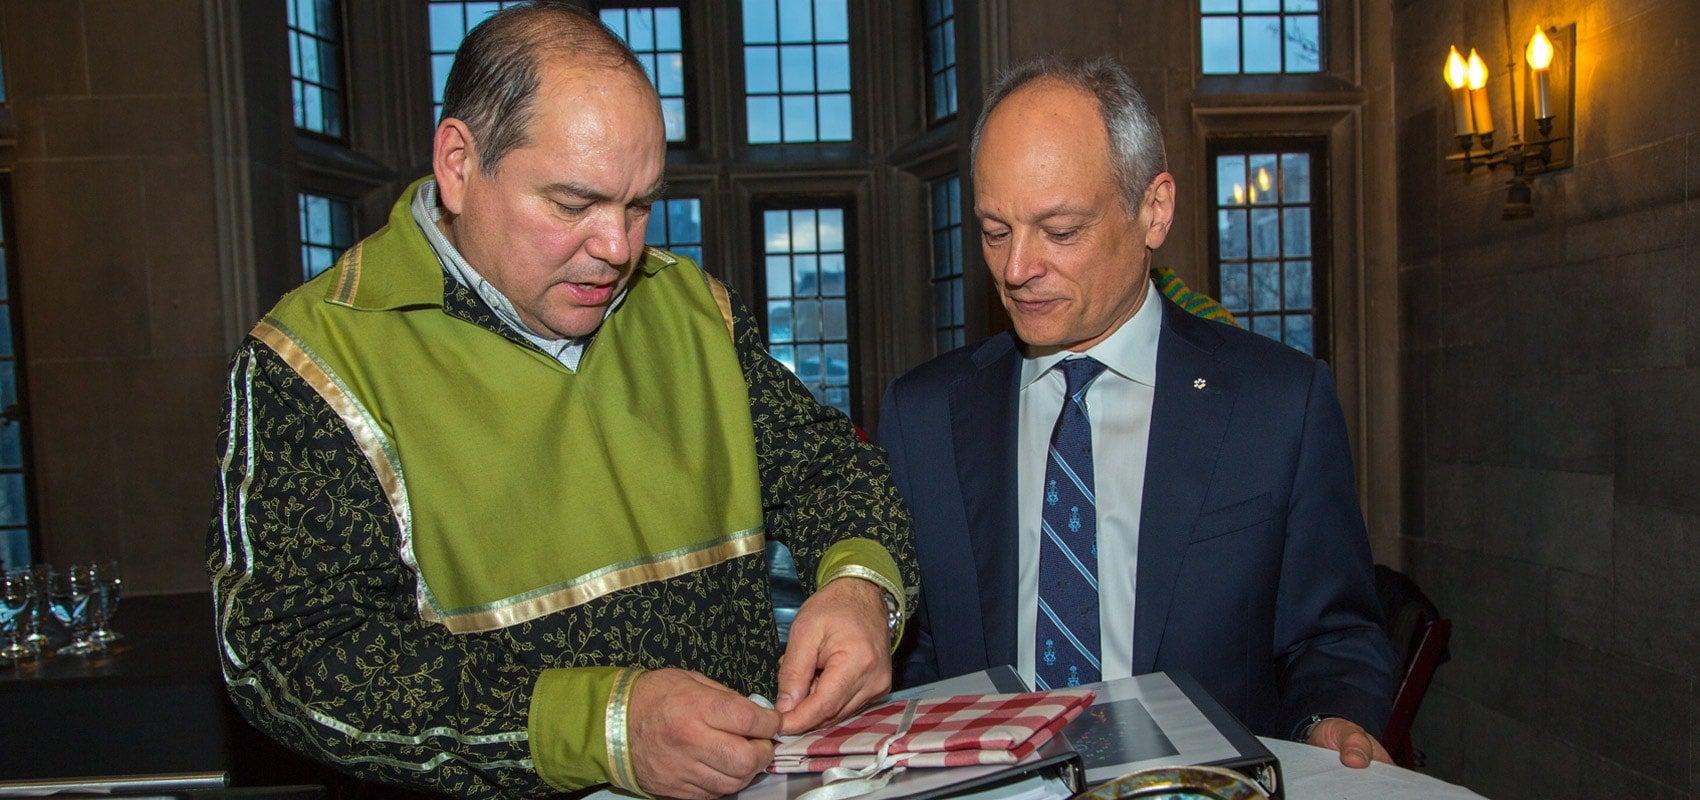 UofT President Gertler with Indigenous student representative